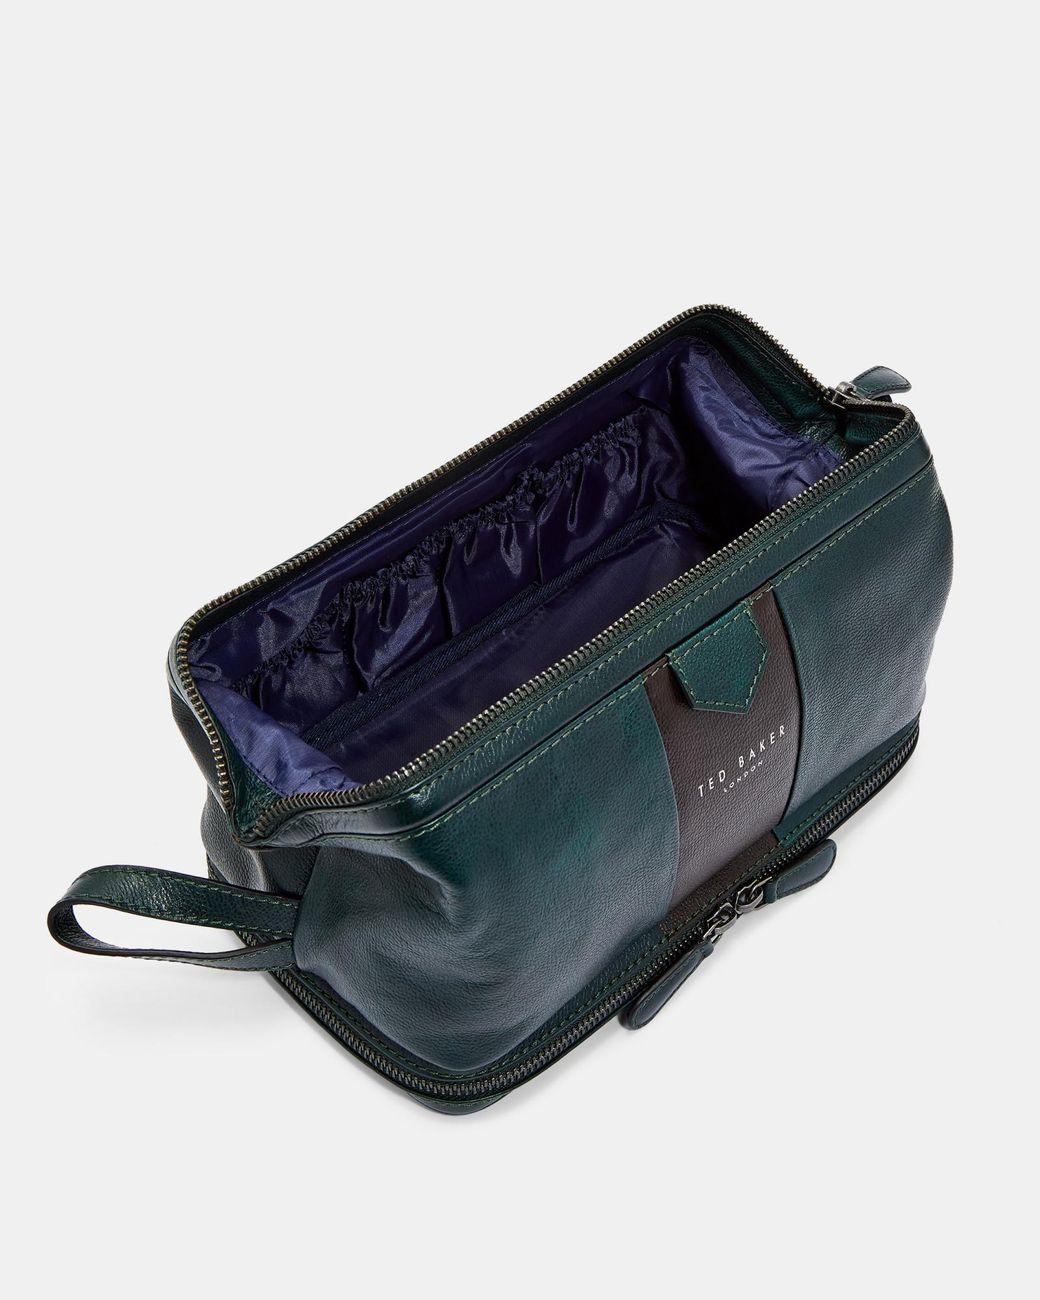 312bdb545 Lyst - Ted Baker Eyez Striped Leather Washbag in Green for Men